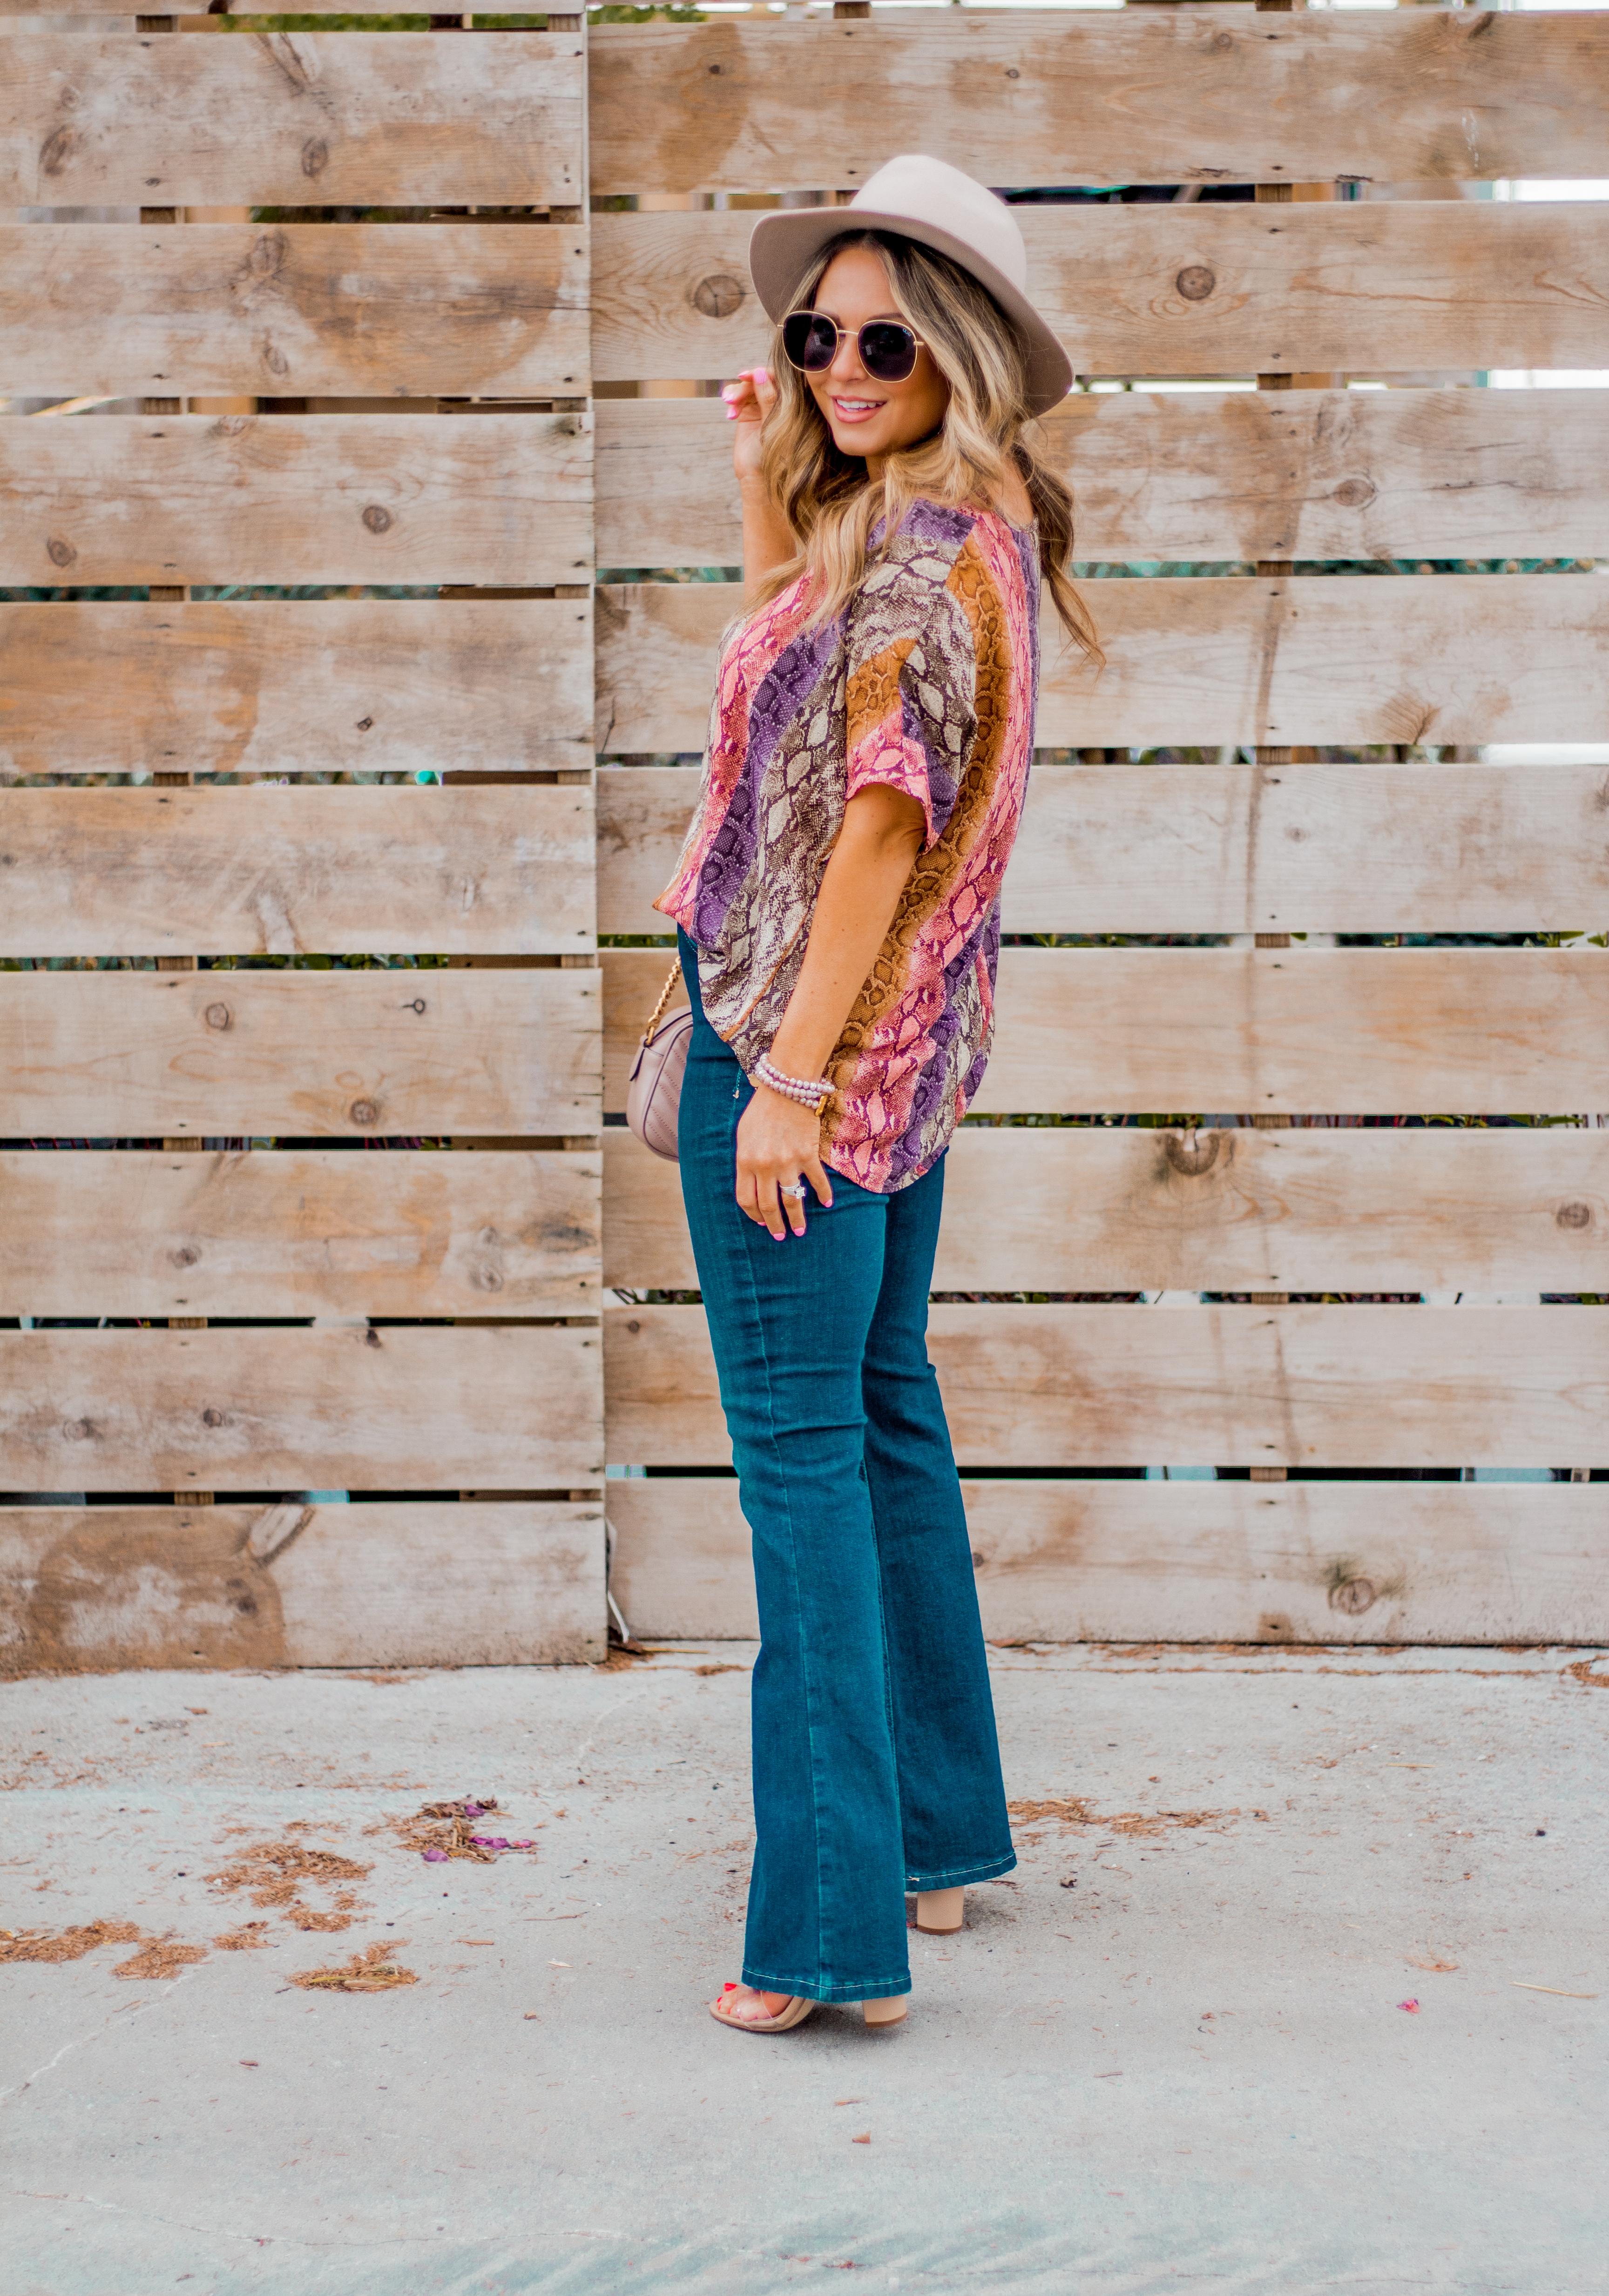 Women's Fashion - Snakeskin Print - Snakeskin Trend - Spring Fashion Trend - Omaha Fashion Blog - Boho Vibes - Flare Jeans - 10